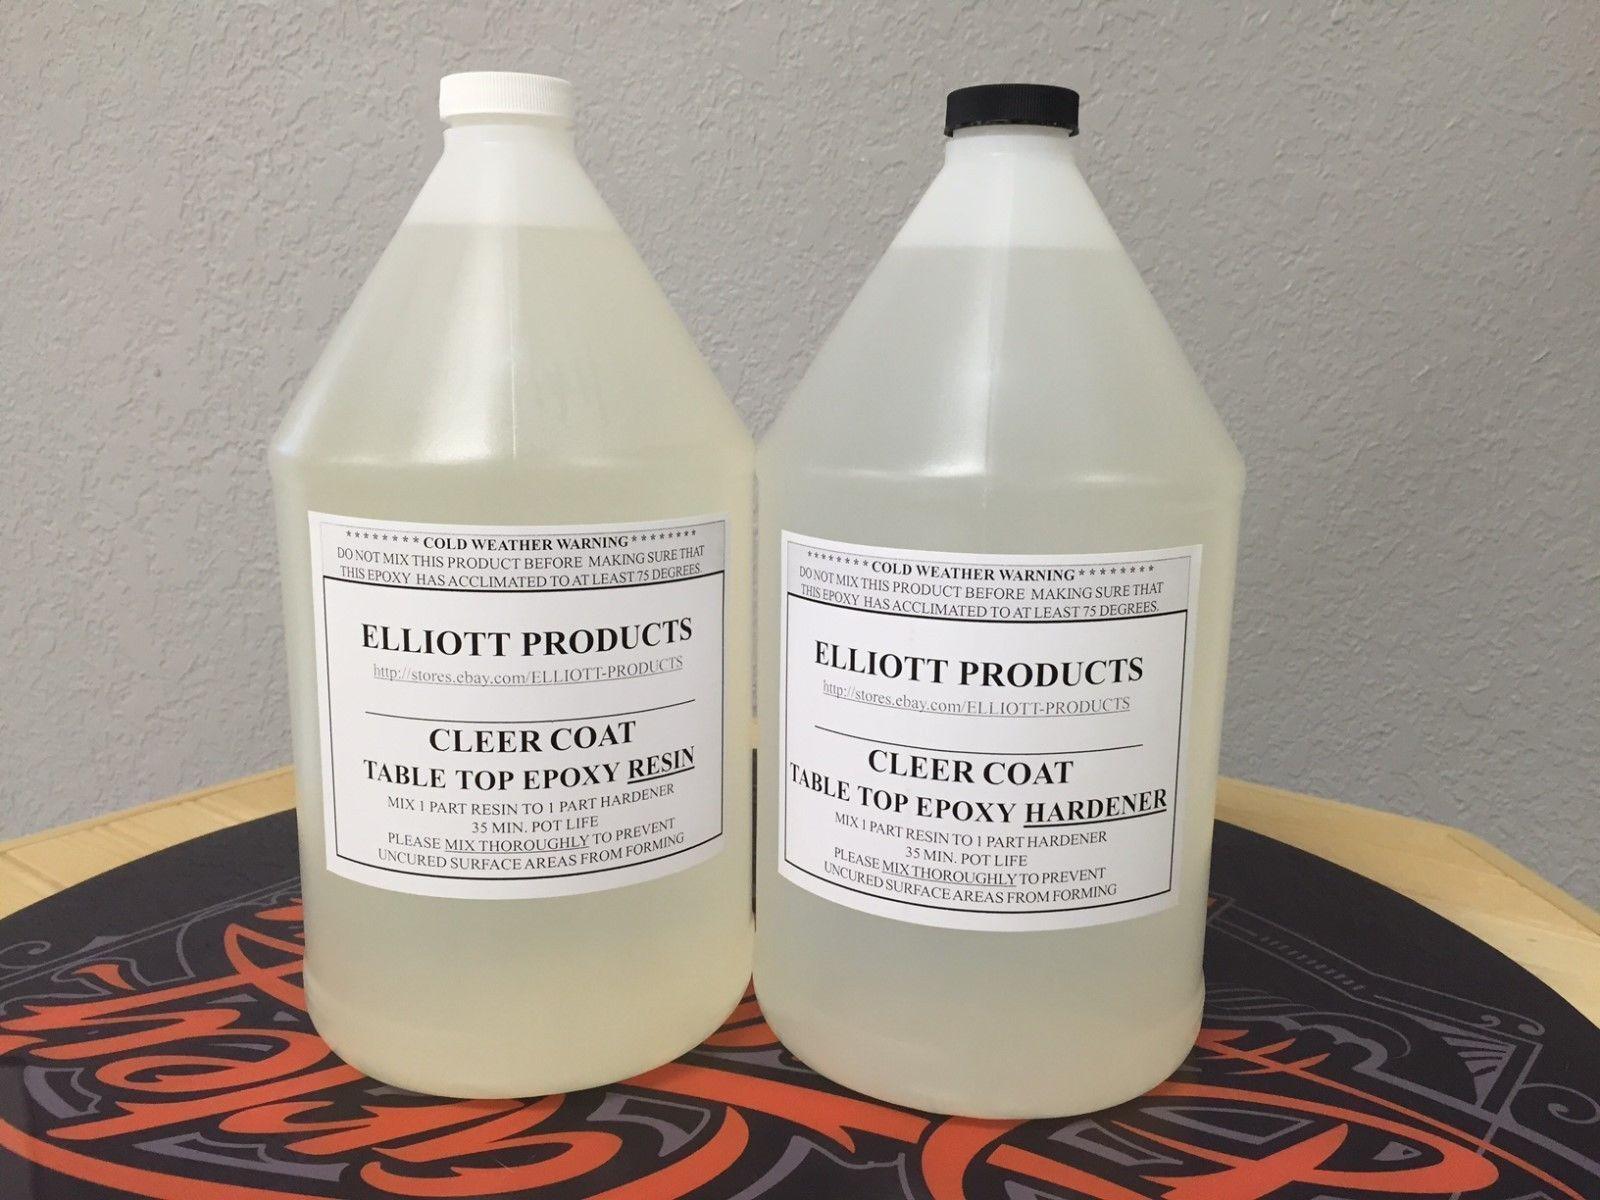 ELLIOTT PRODUCTS